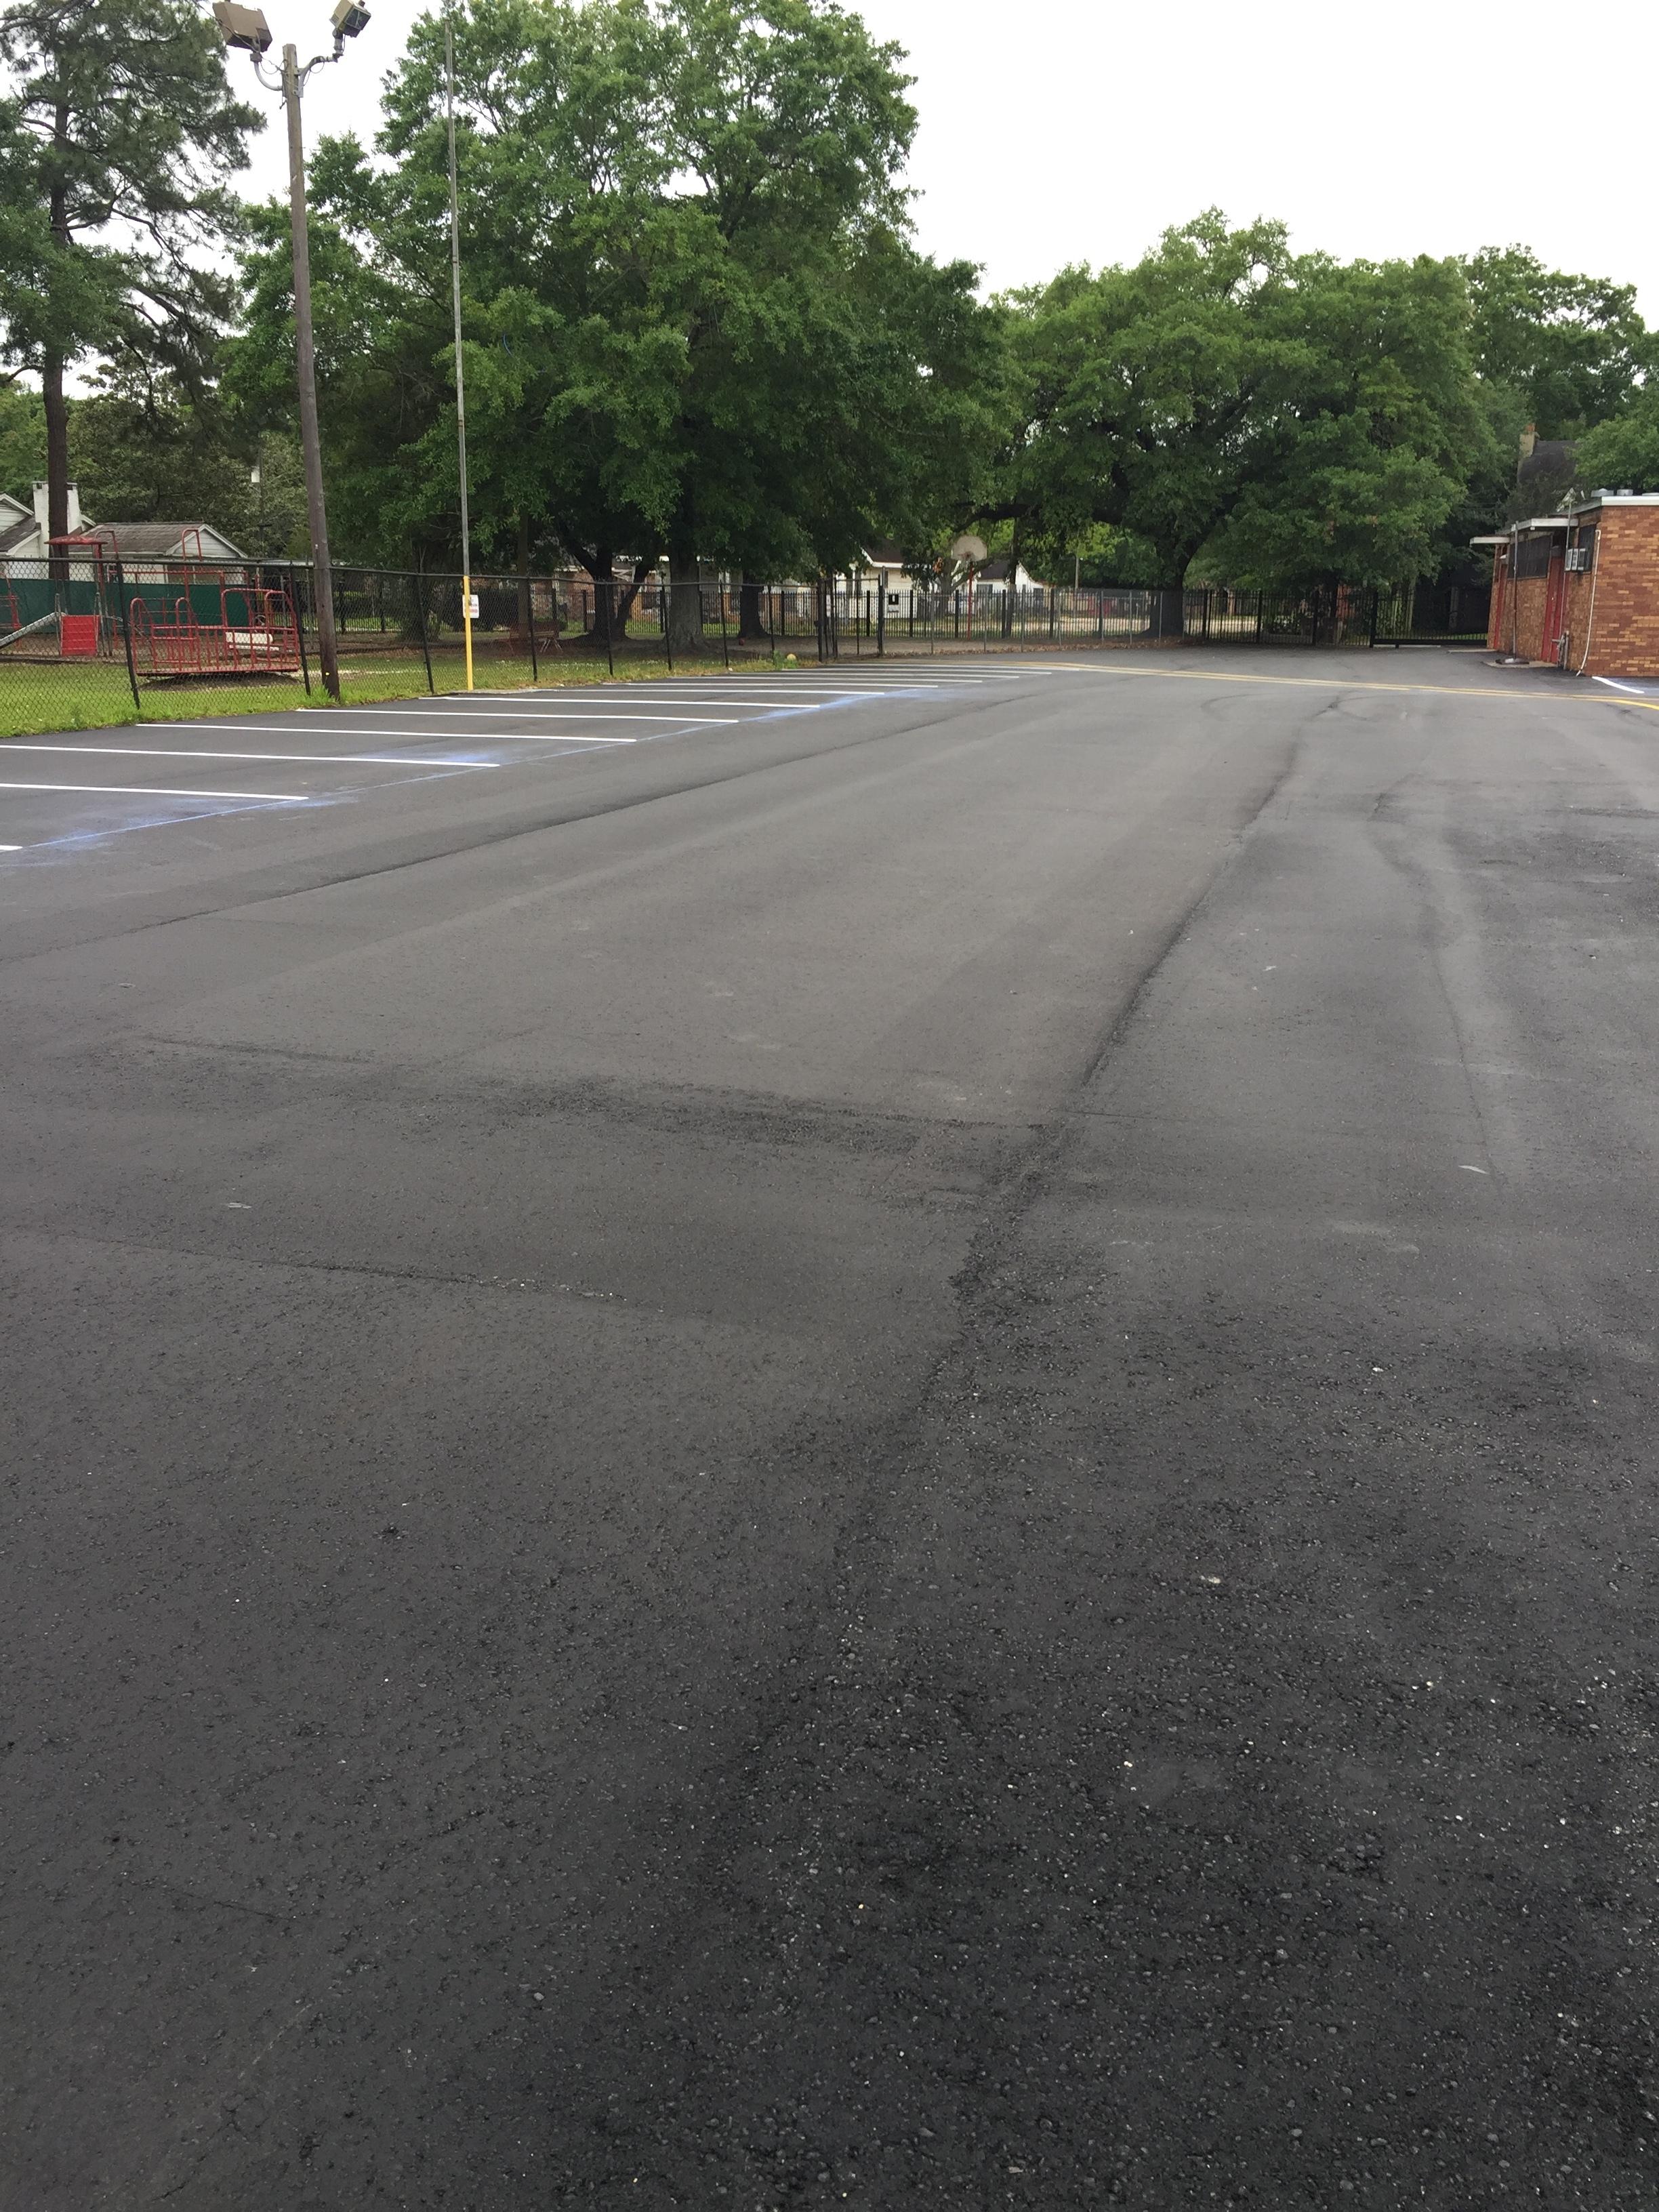 Repaving the School Parking Lot